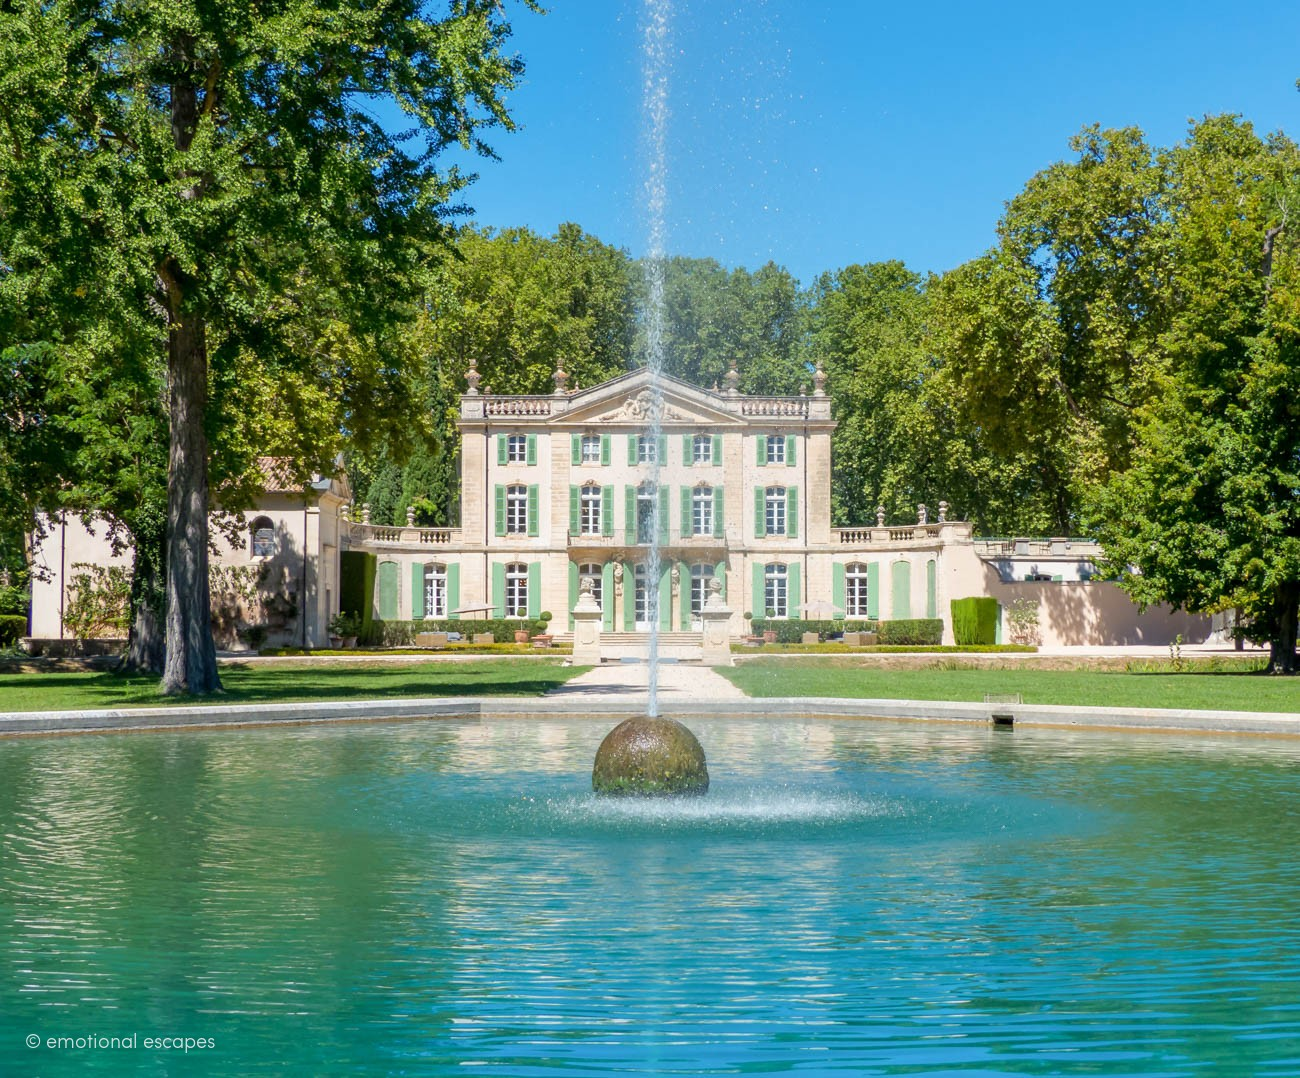 south of france luxury villas Aix-en-Provence